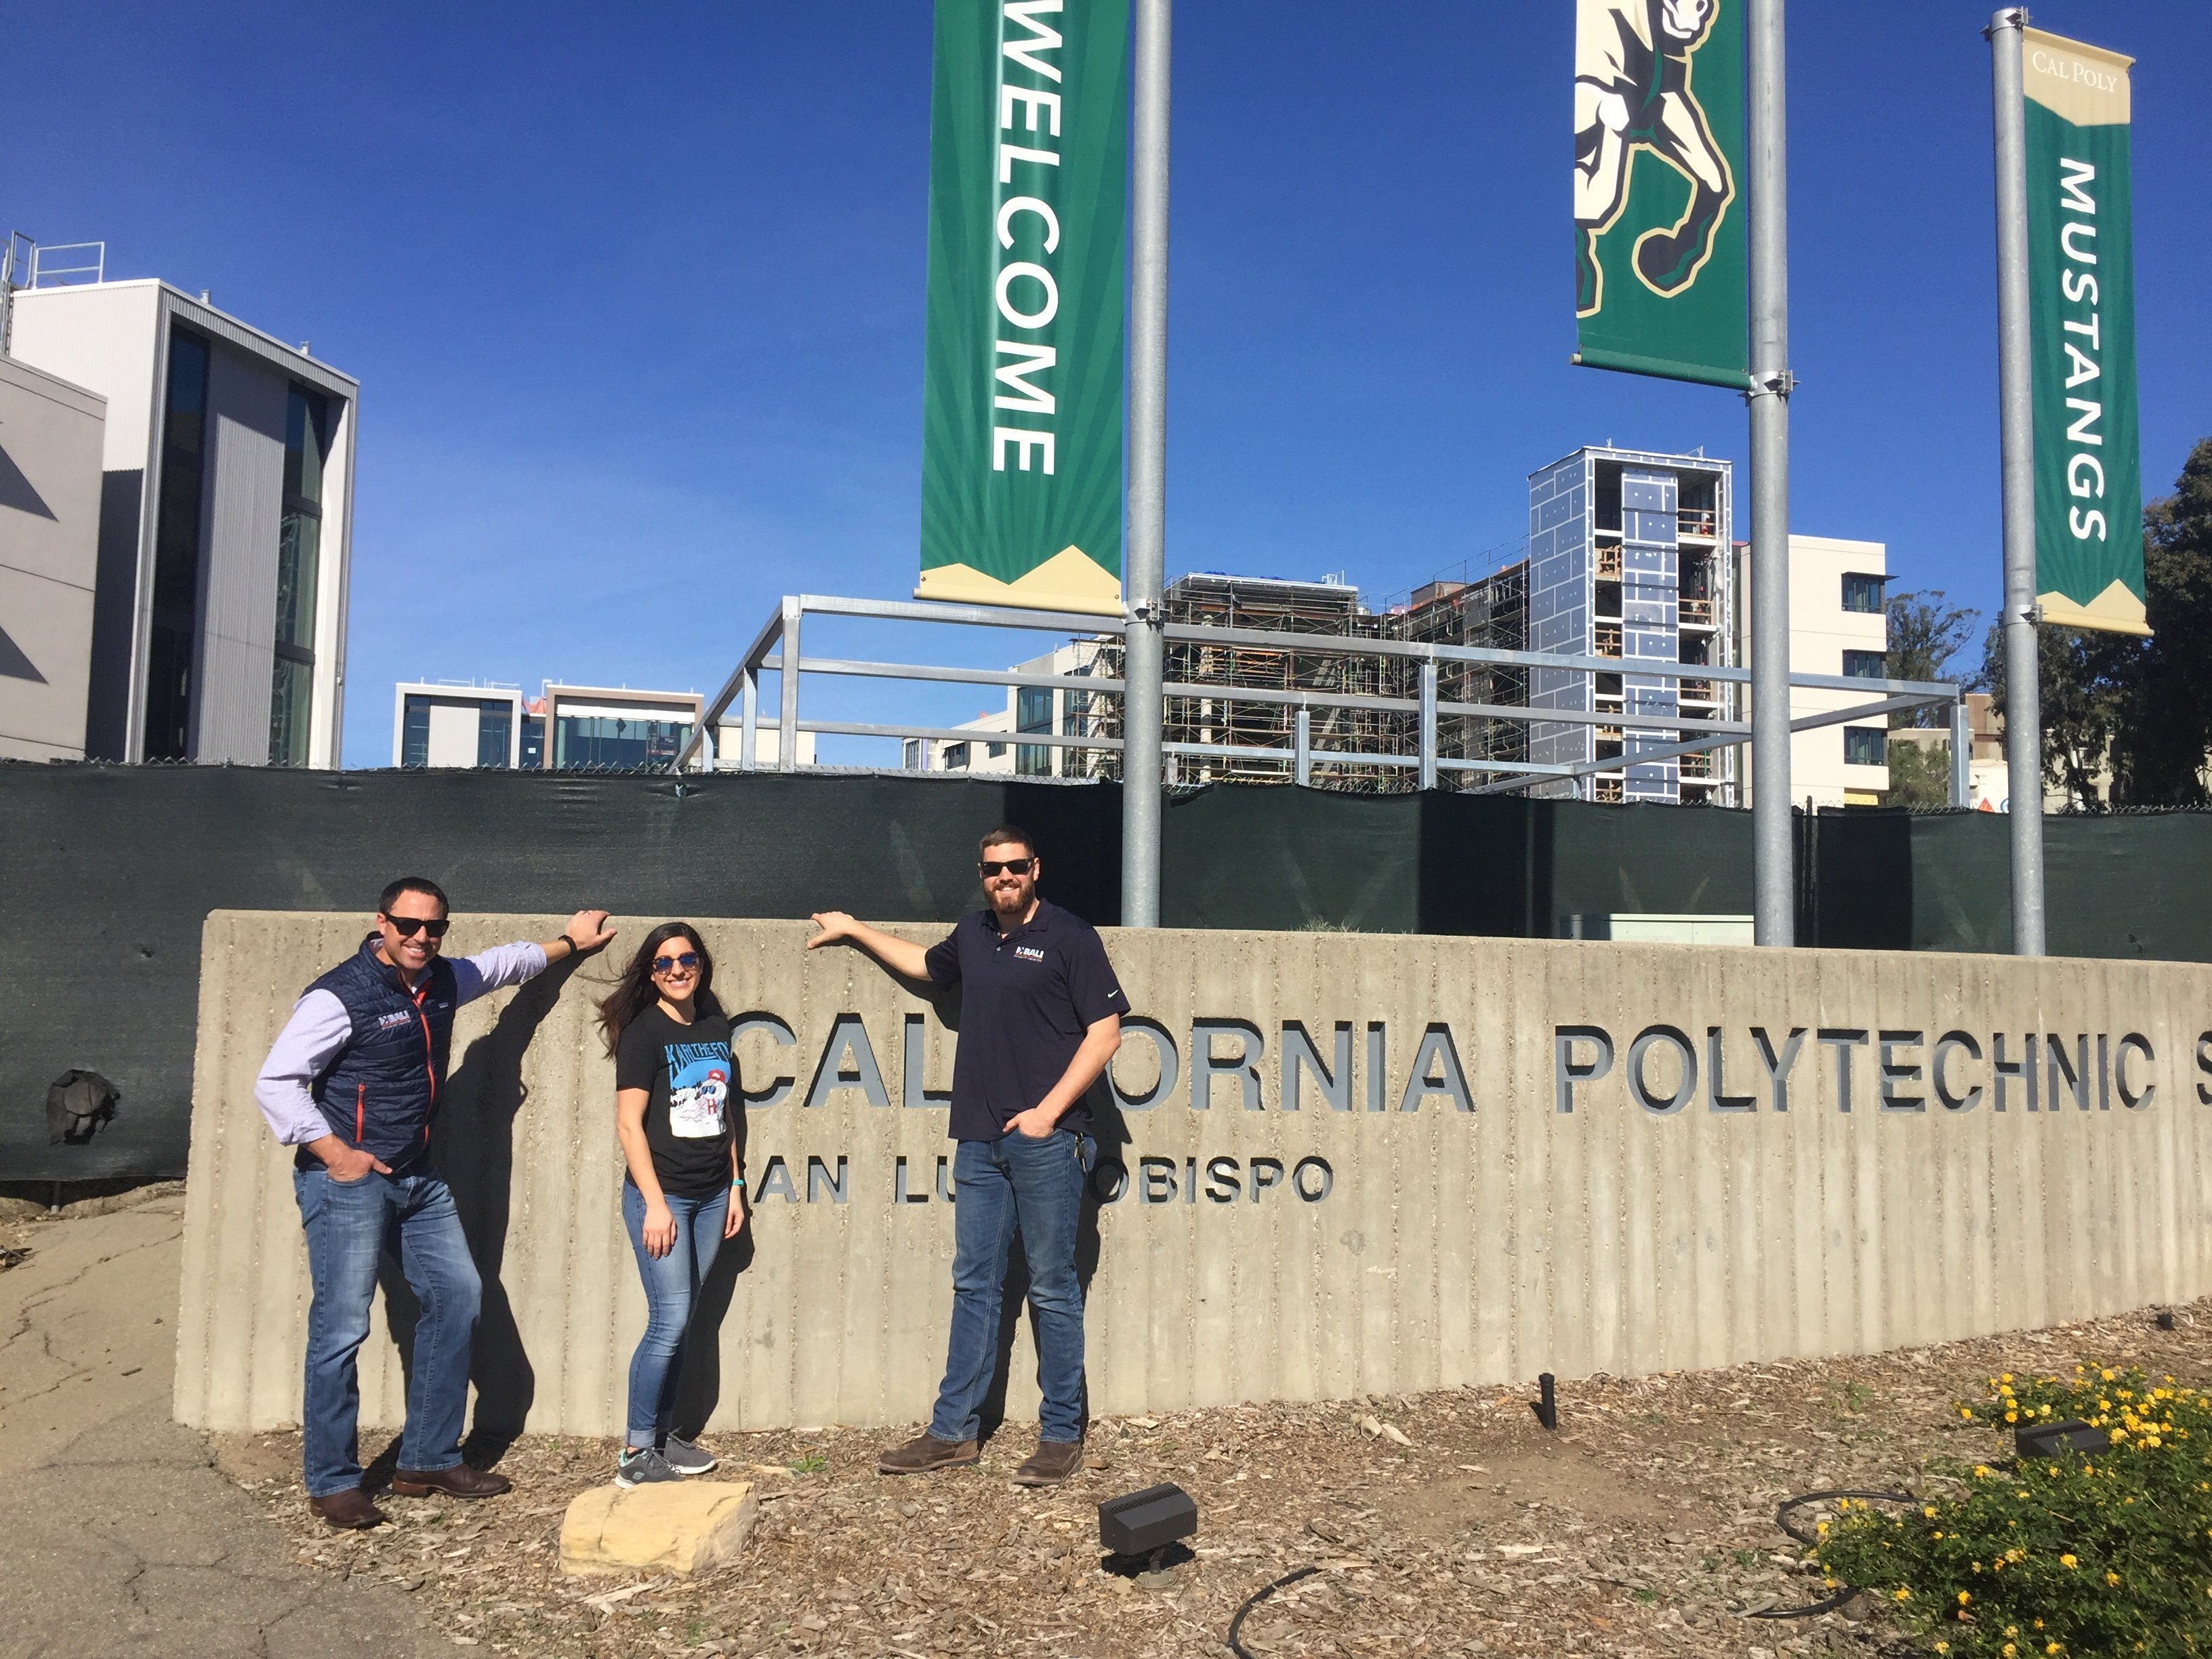 california polytechnic